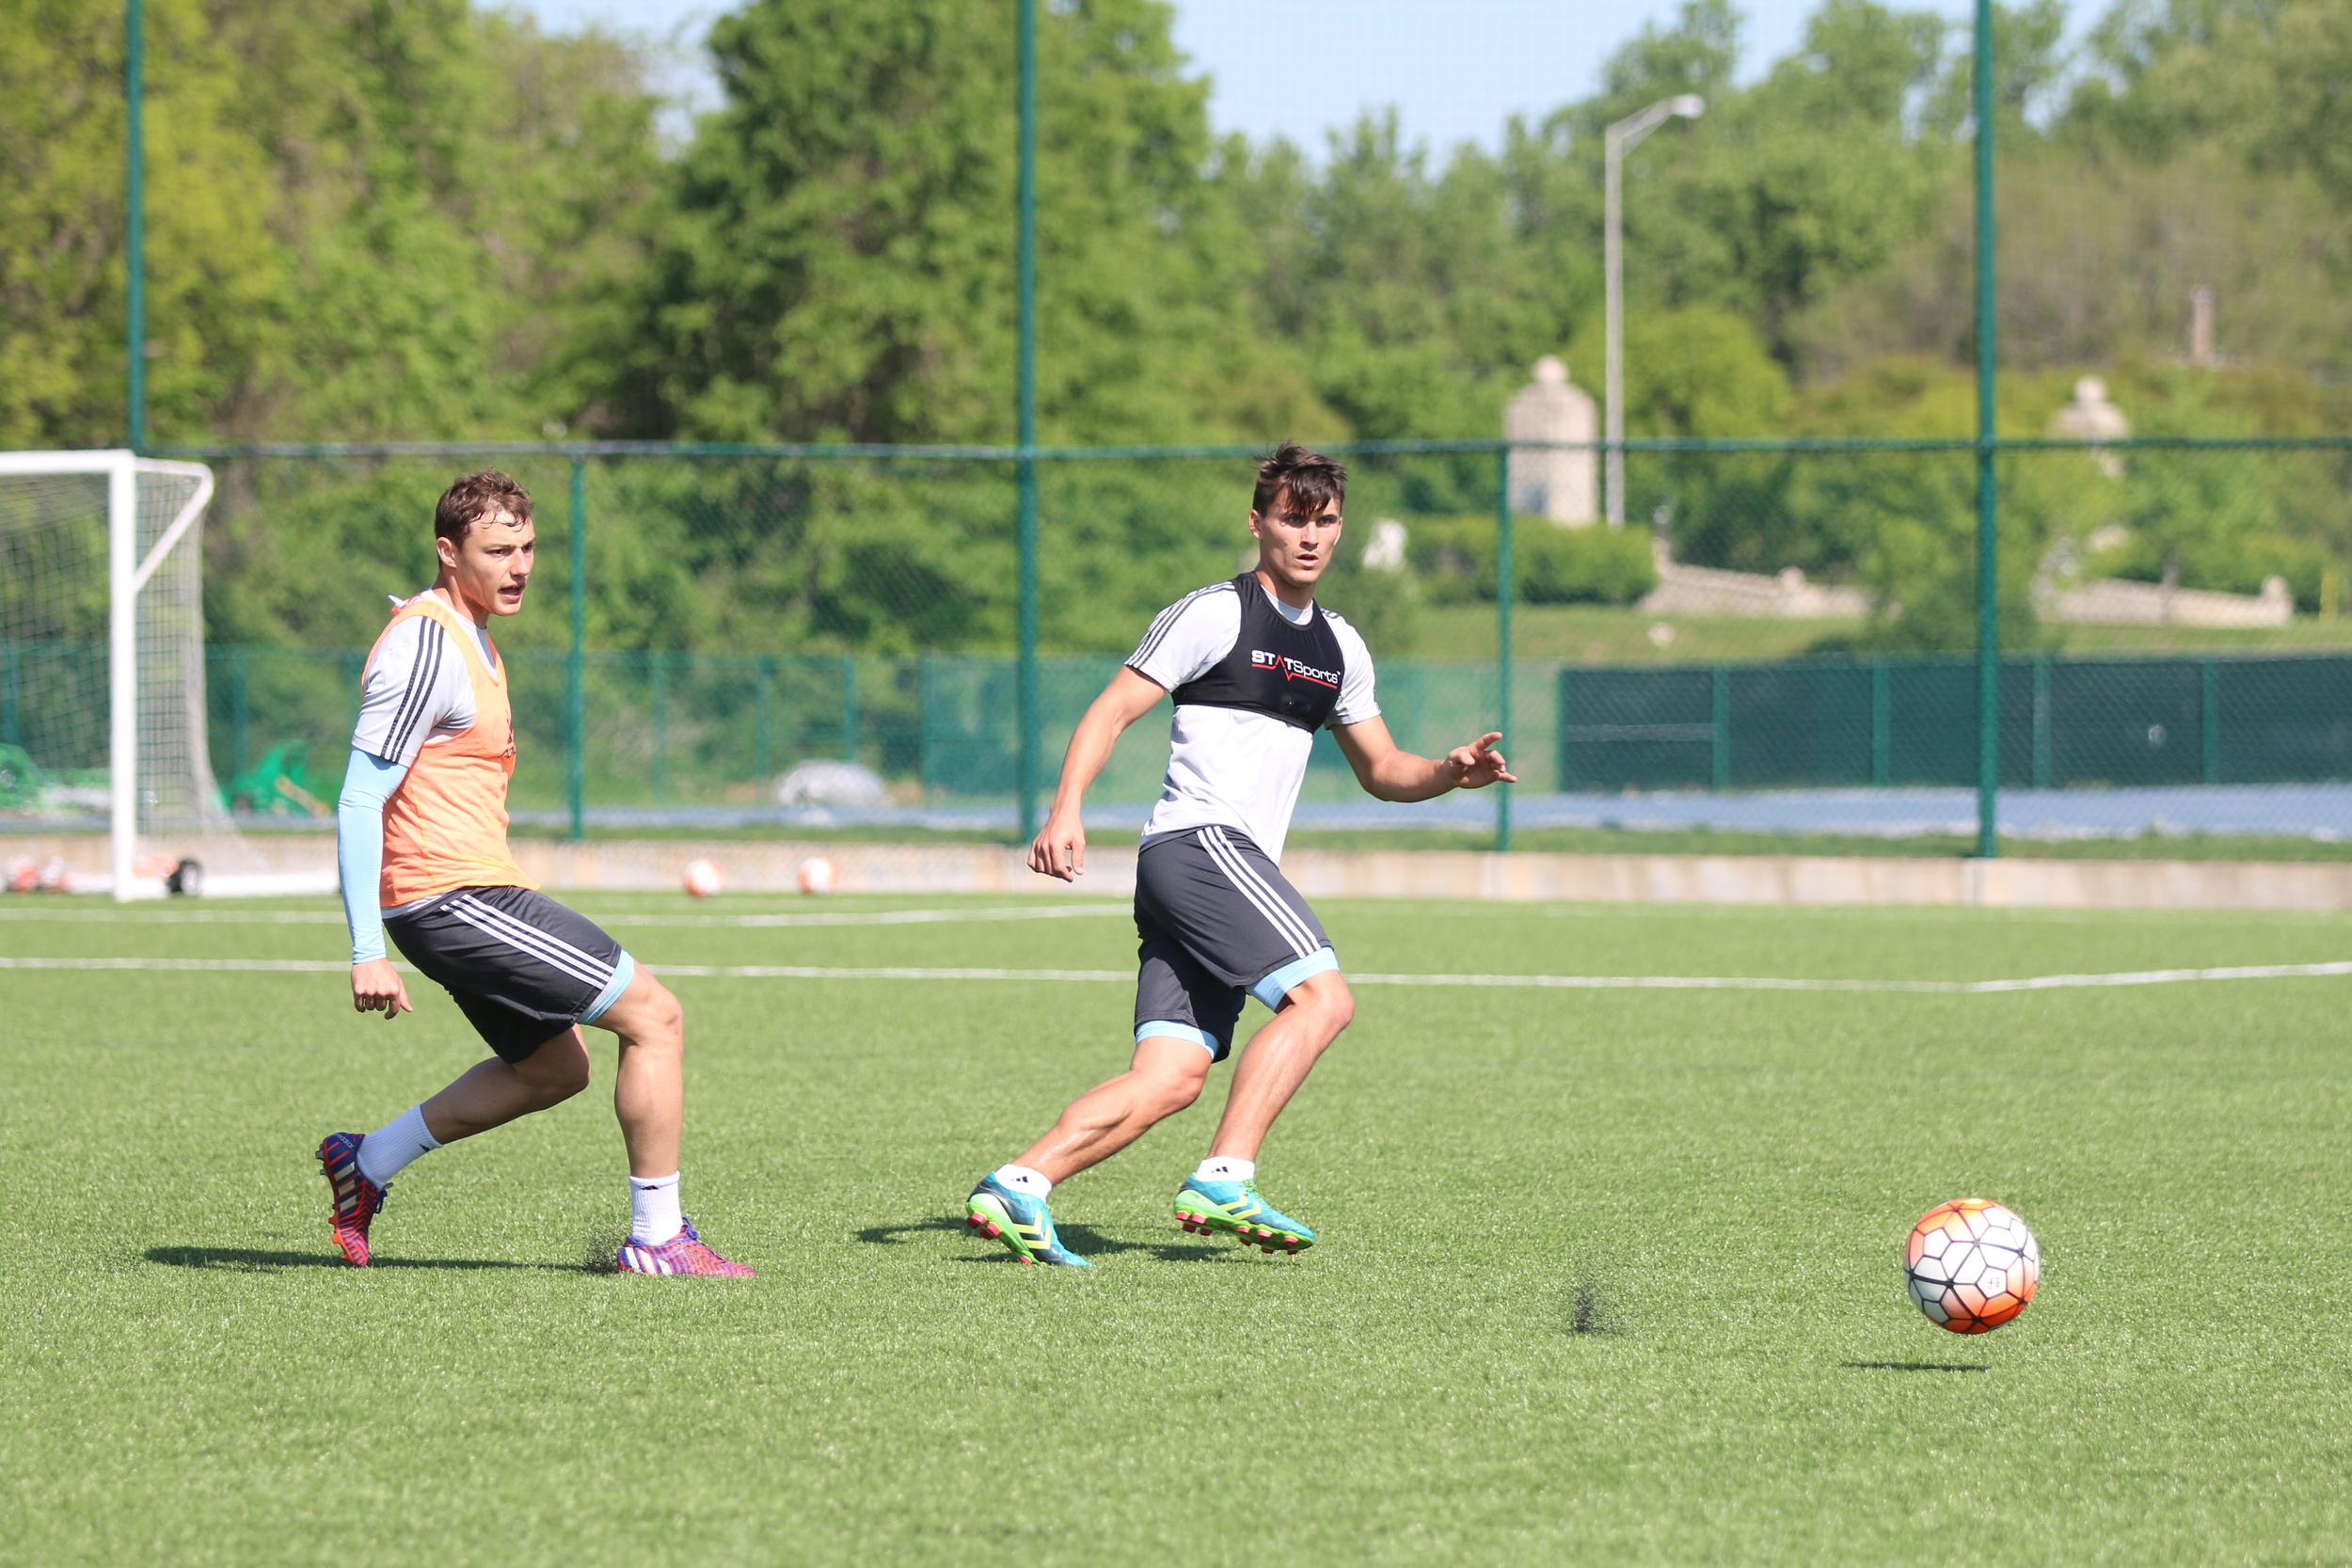 Training_0267.JPG